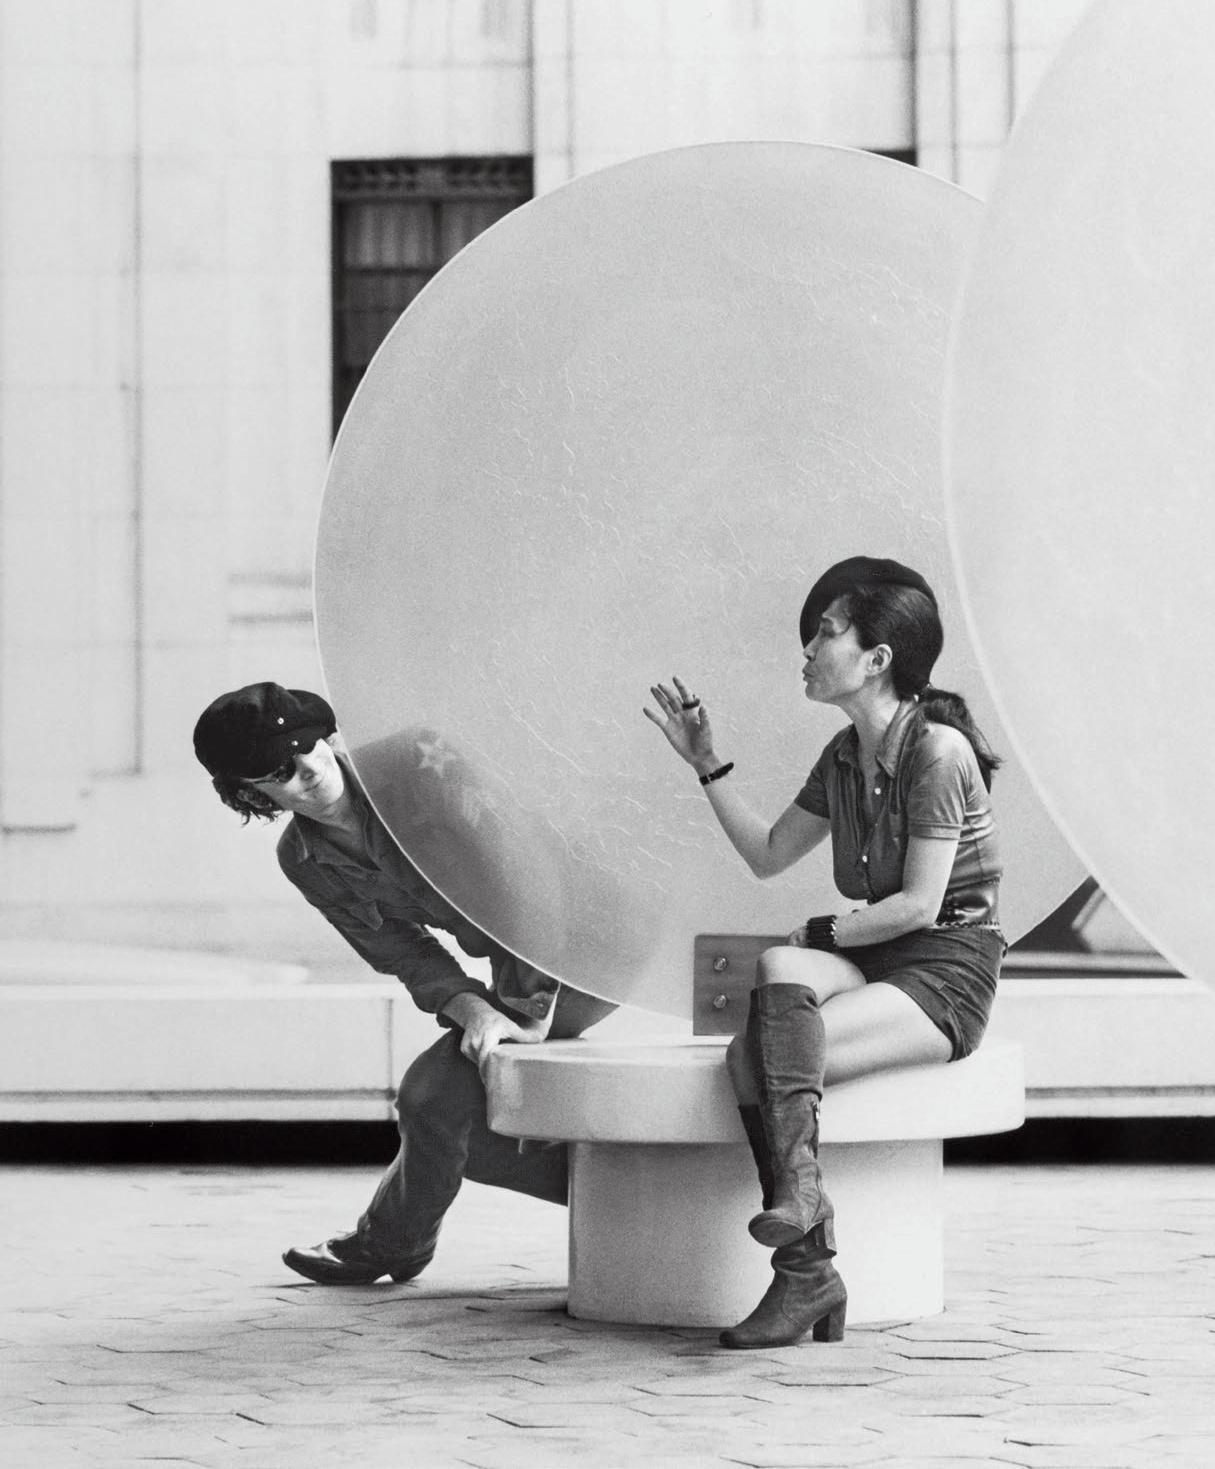 Not the only one: how Yoko Ono helped create John Lennon's Imagine